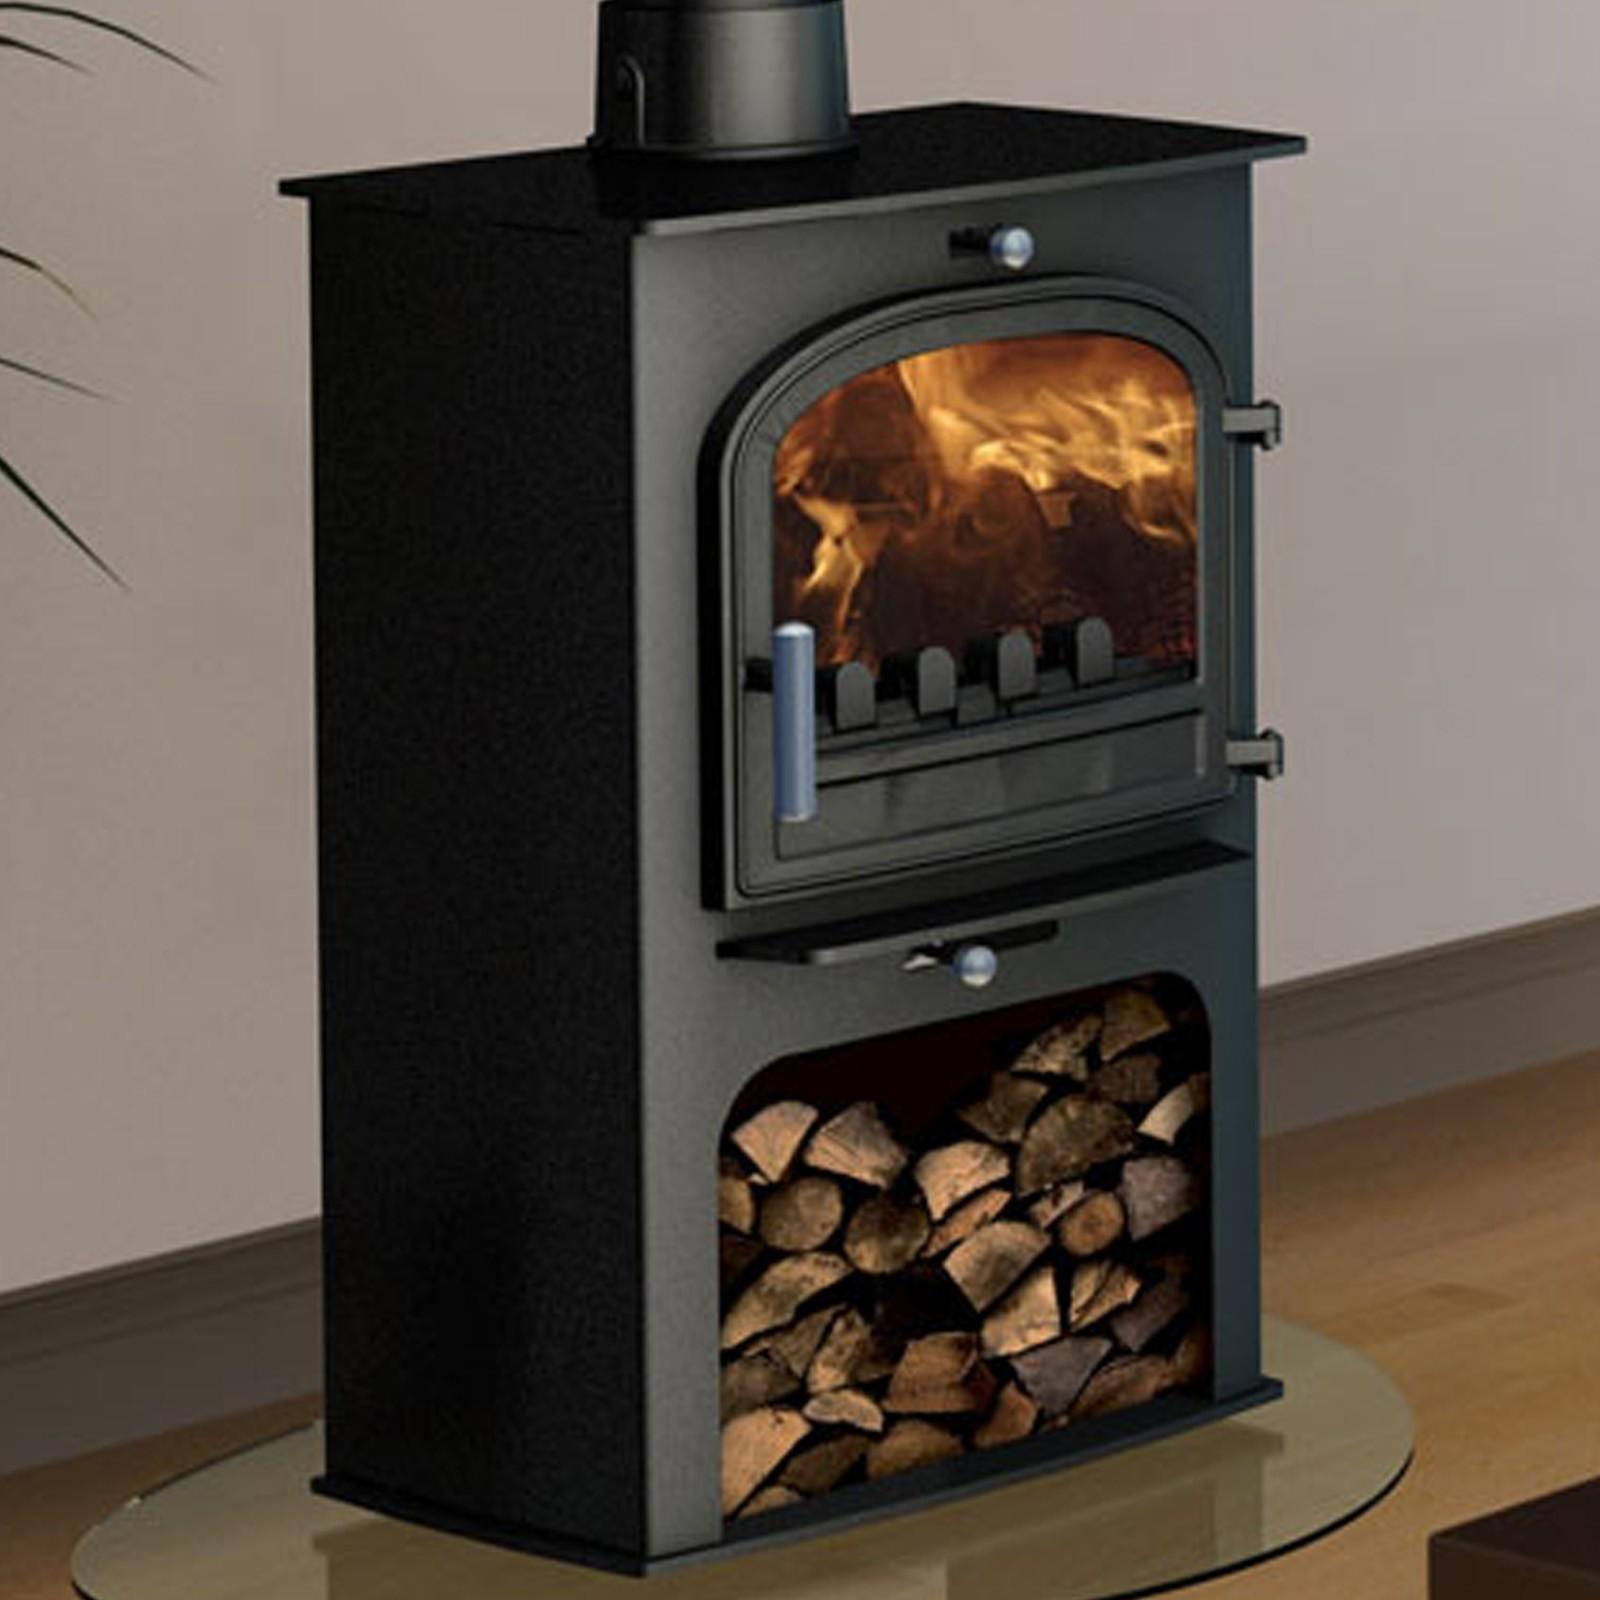 Superb Delivery Cleanburn Norreskoven Mk2 Multifuel Woodburning Stove Great Deals